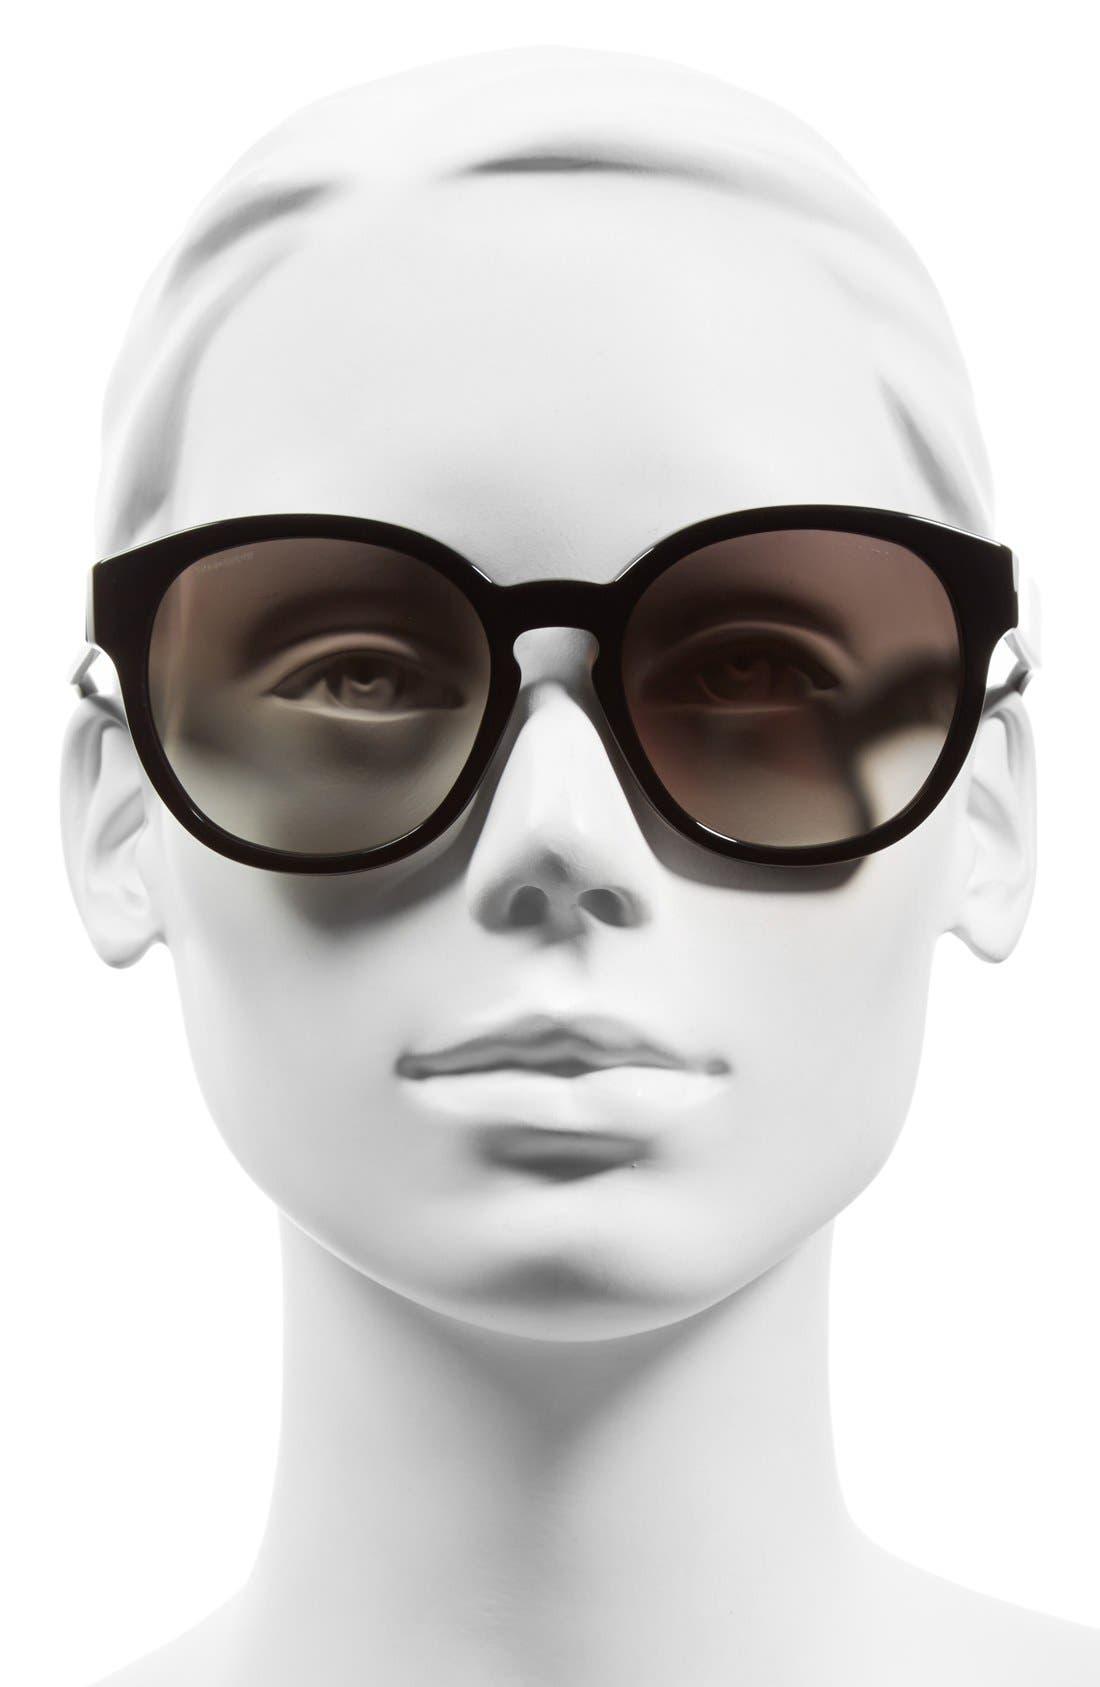 56mm Keyhole Sunglasses,                             Alternate thumbnail 2, color,                             Black